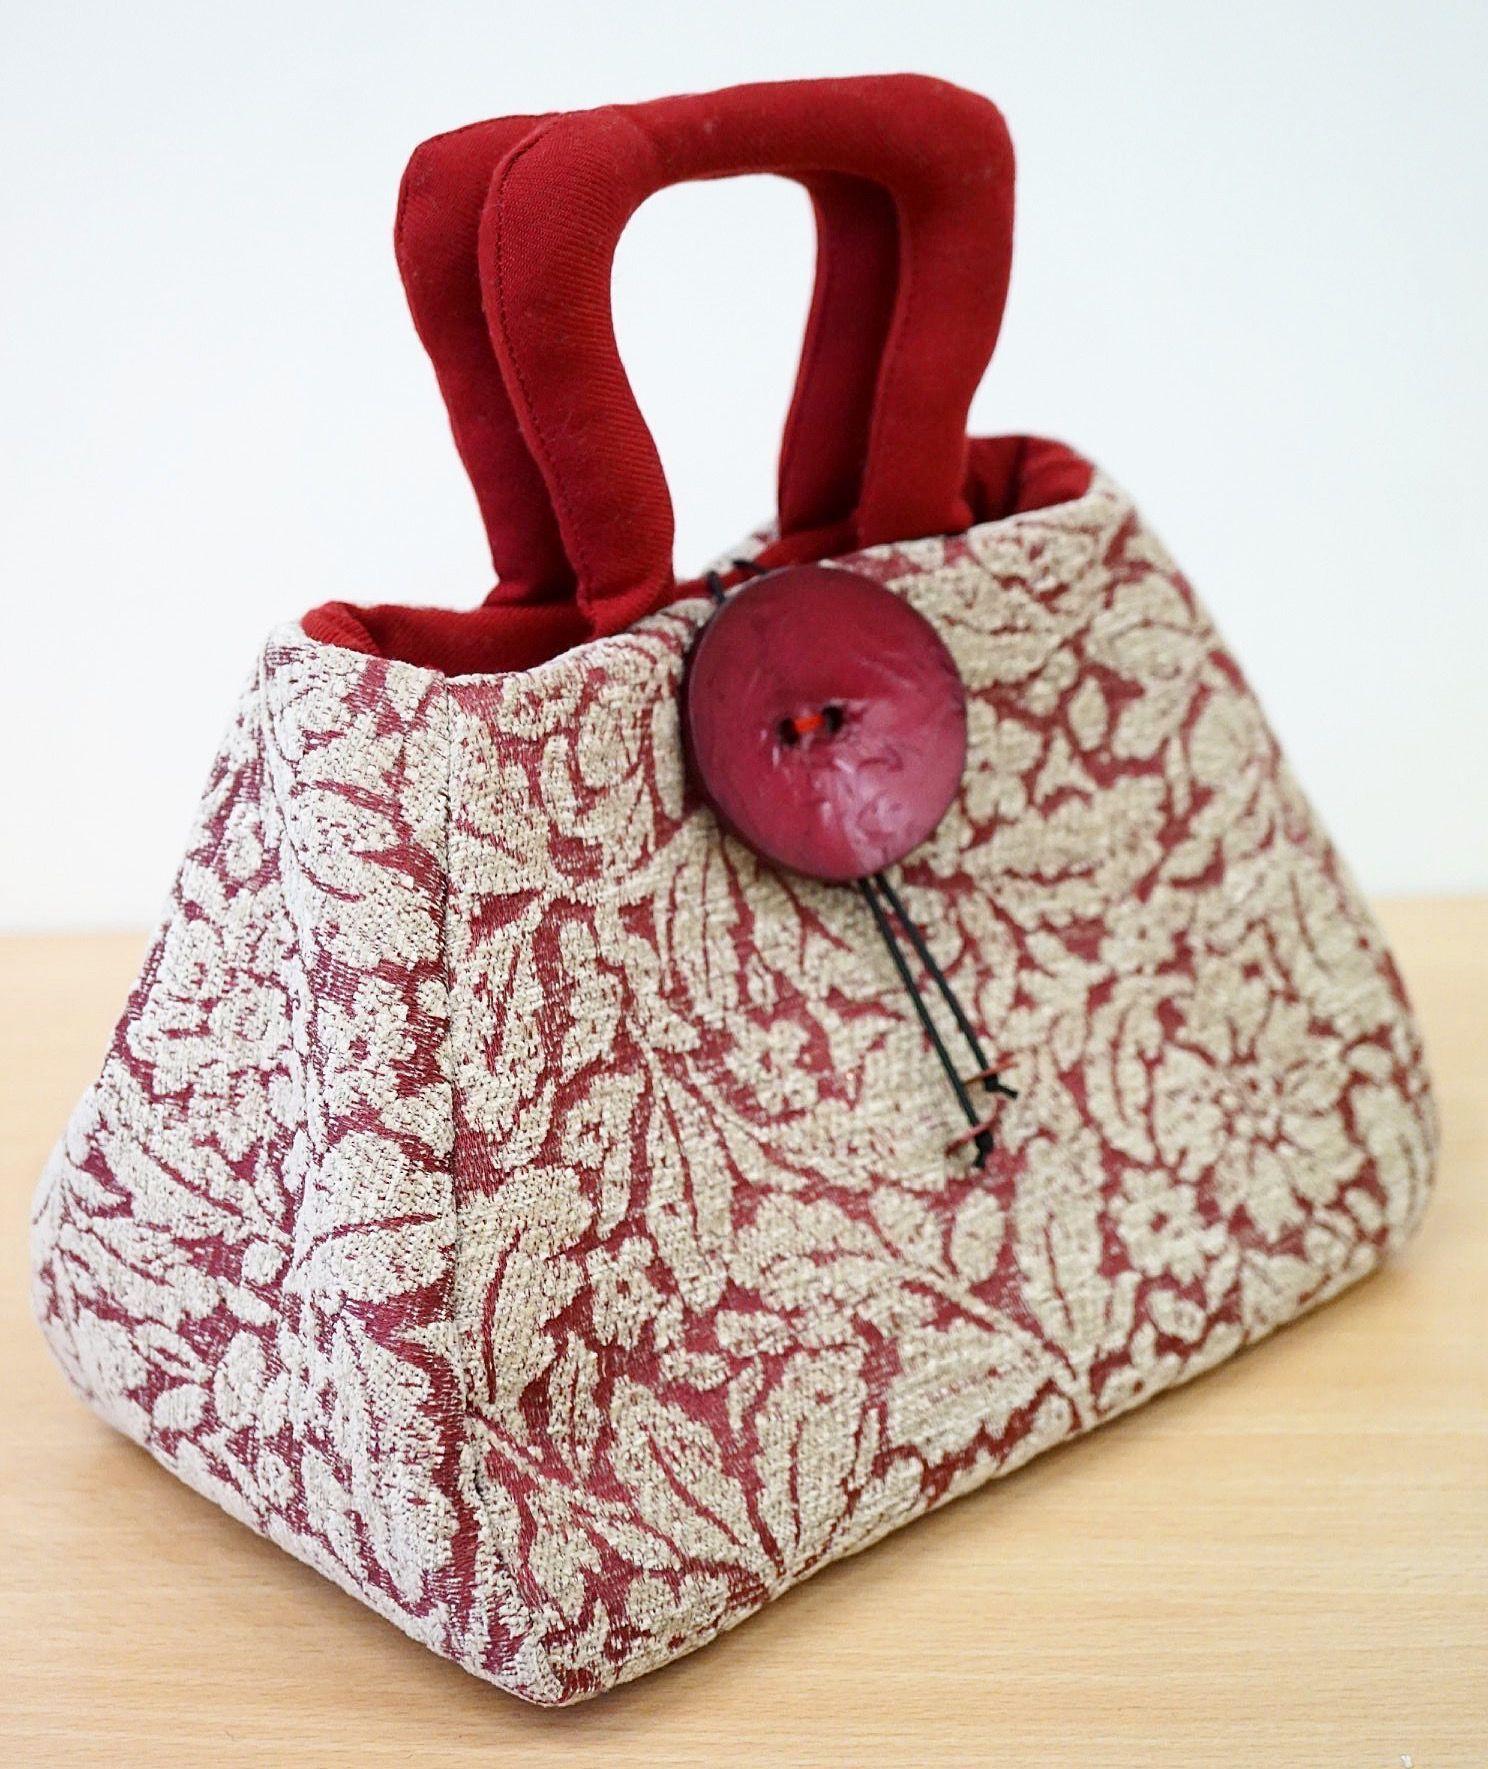 Muckle Fantoosh Handbag Designed Ad